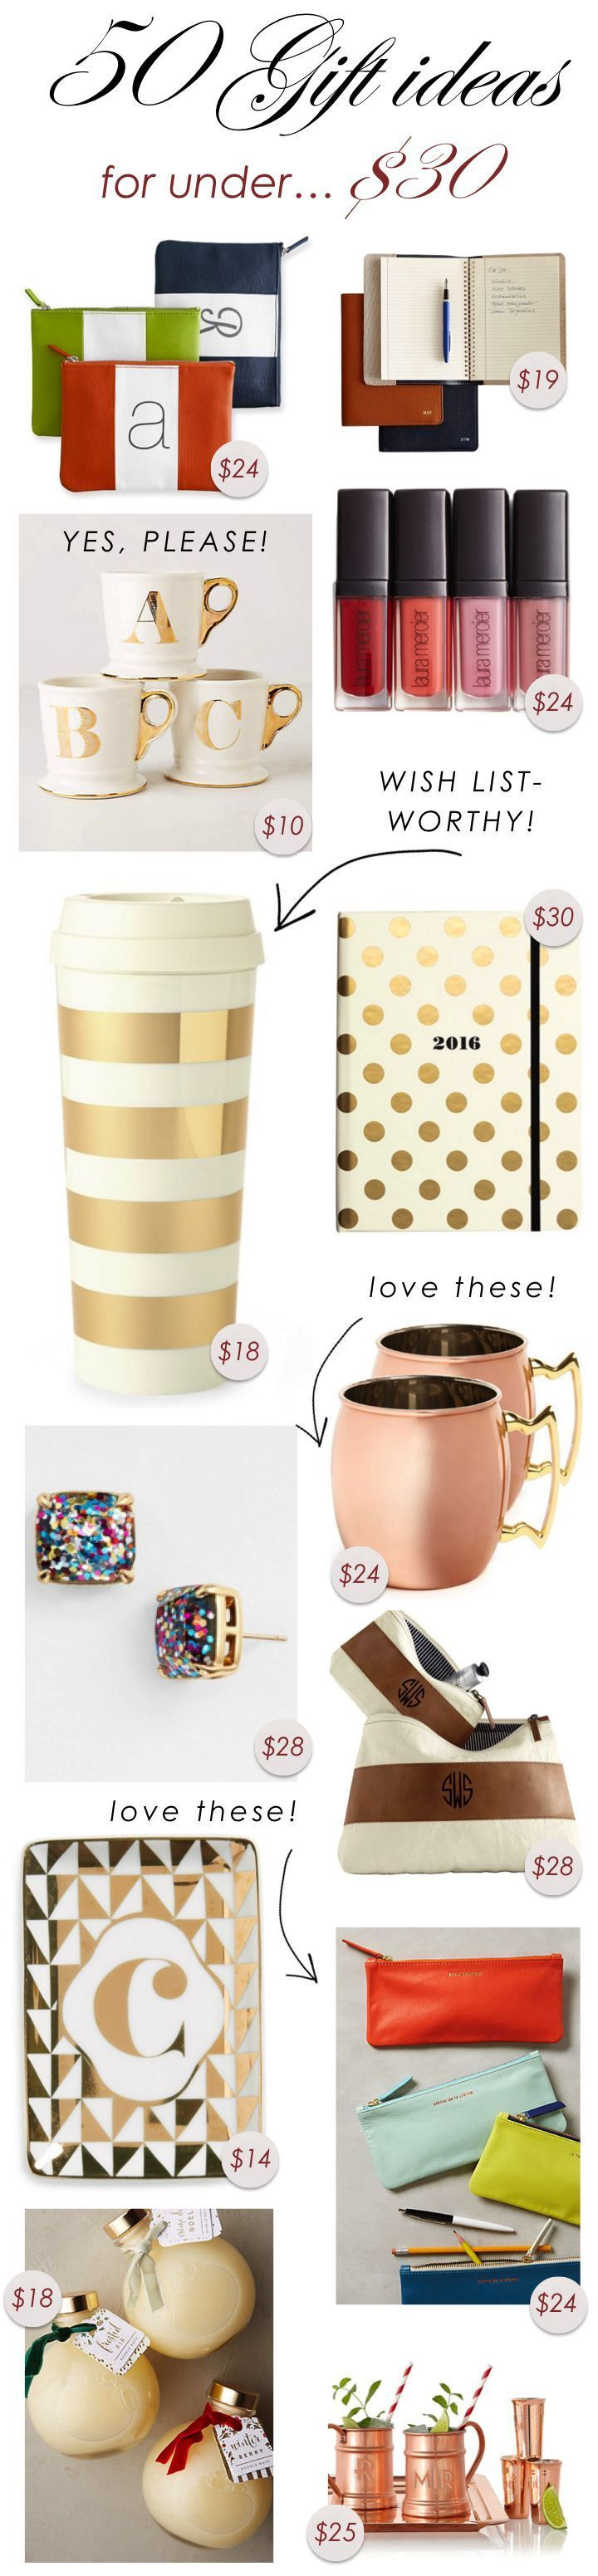 50 Gift Ideas for Under $30 - #Gift #ideas #under - # ...